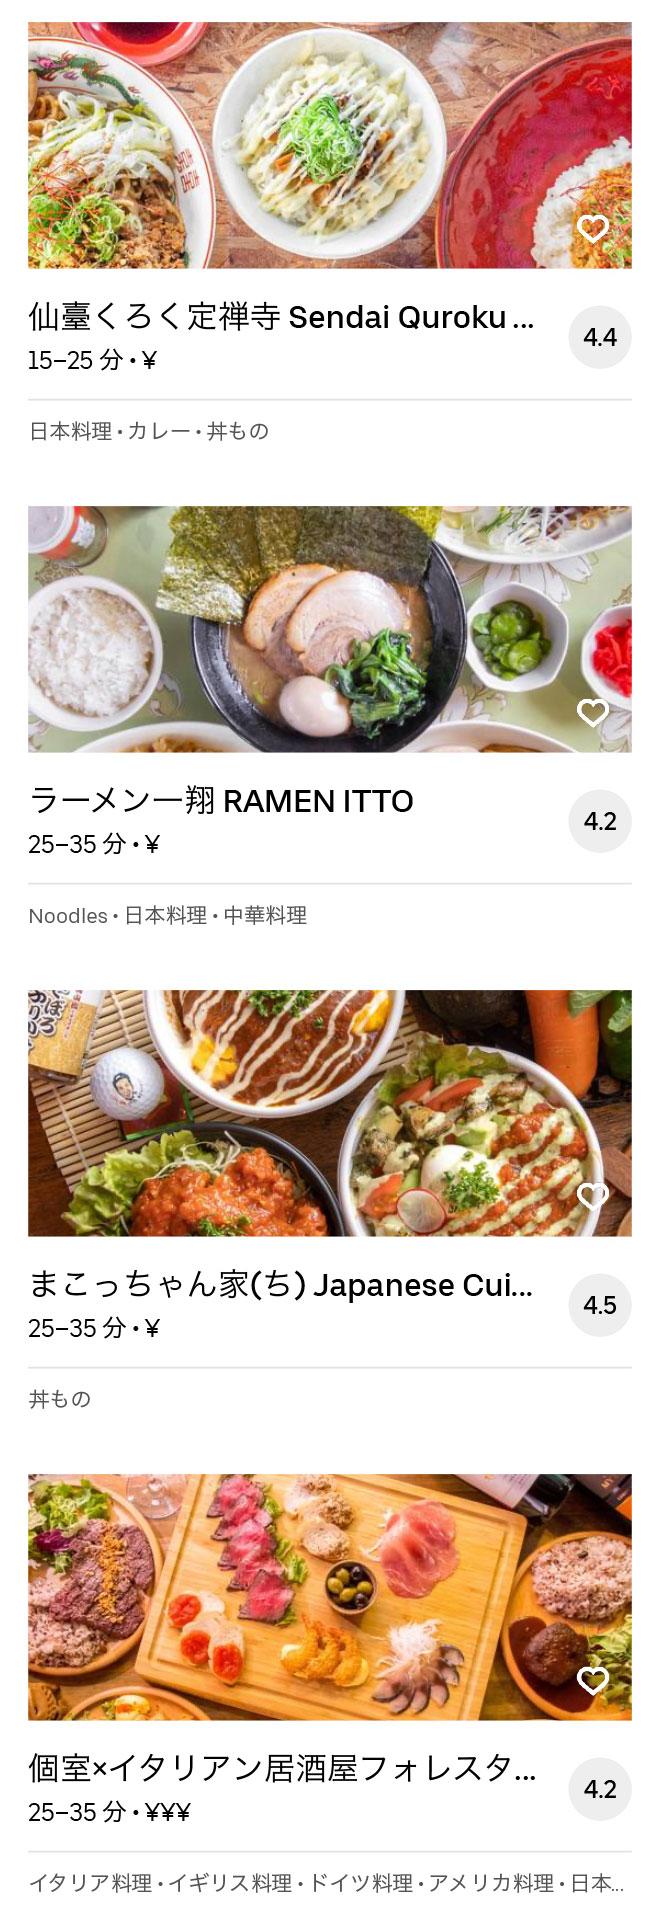 Sendai menu 200405